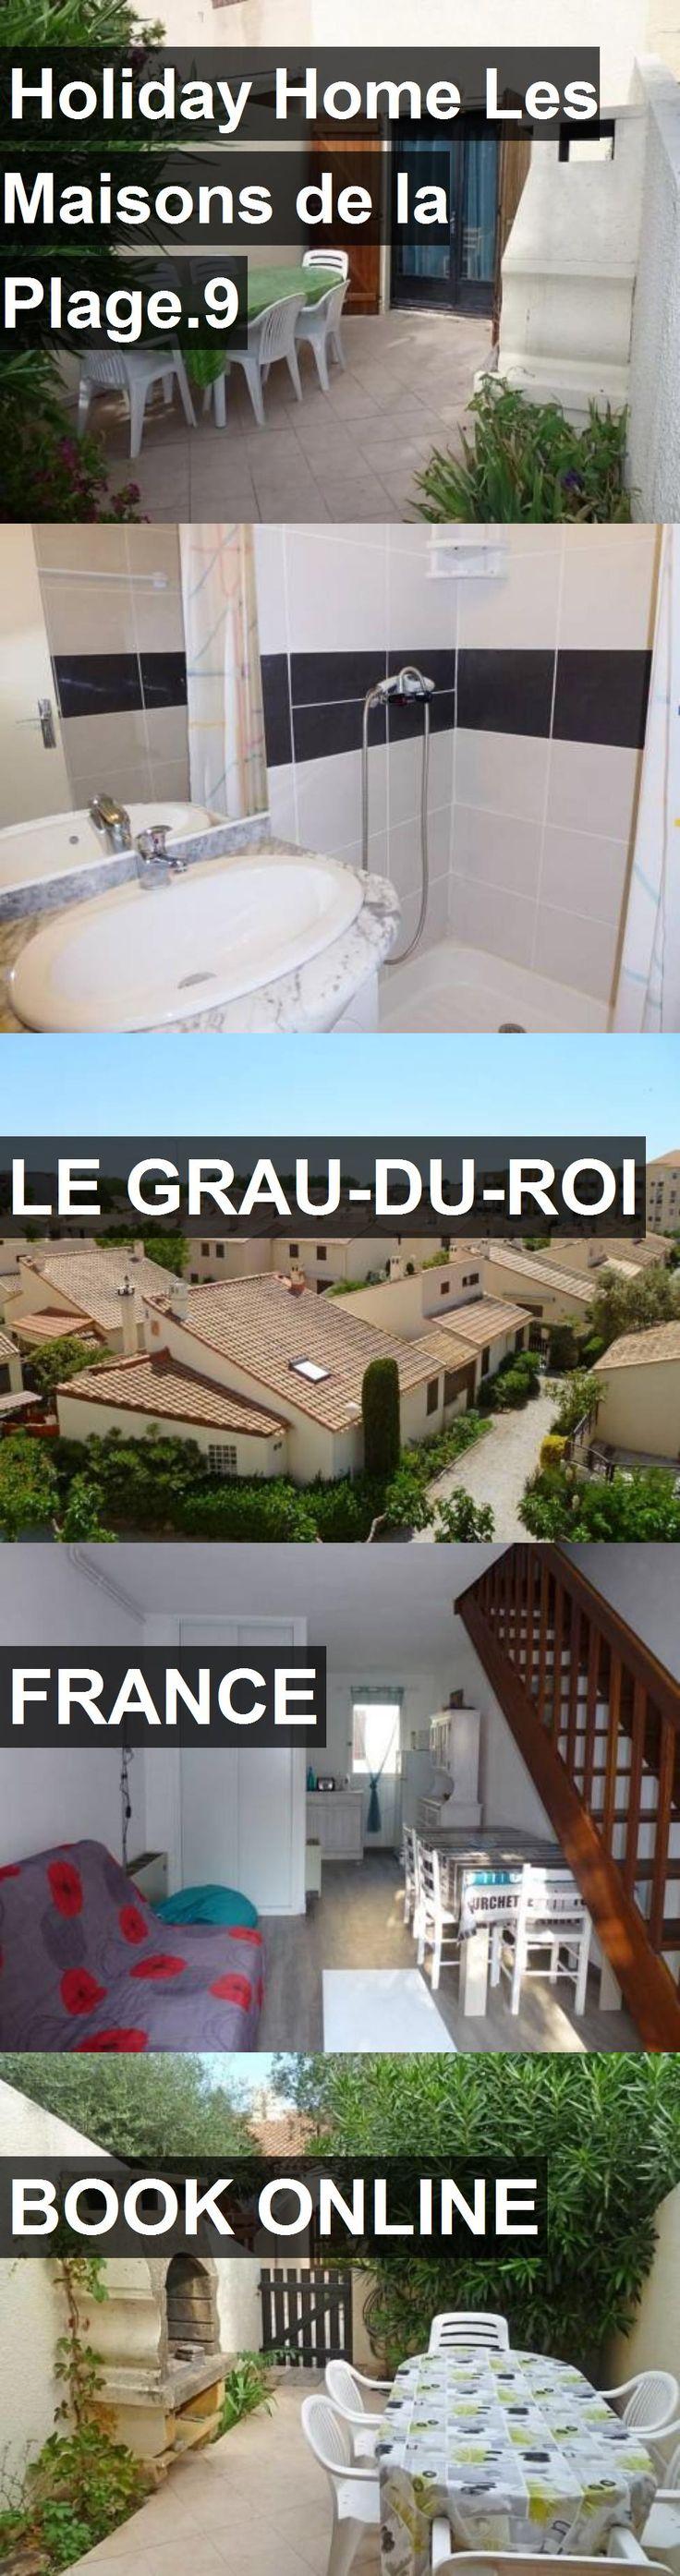 Hotel Holiday Home Les Maisons de la Plage.9 in Le Grau-du-Roi, France. For more information, photos, reviews and best prices please follow the link. #France #LeGrau-du-Roi #travel #vacation #hotel